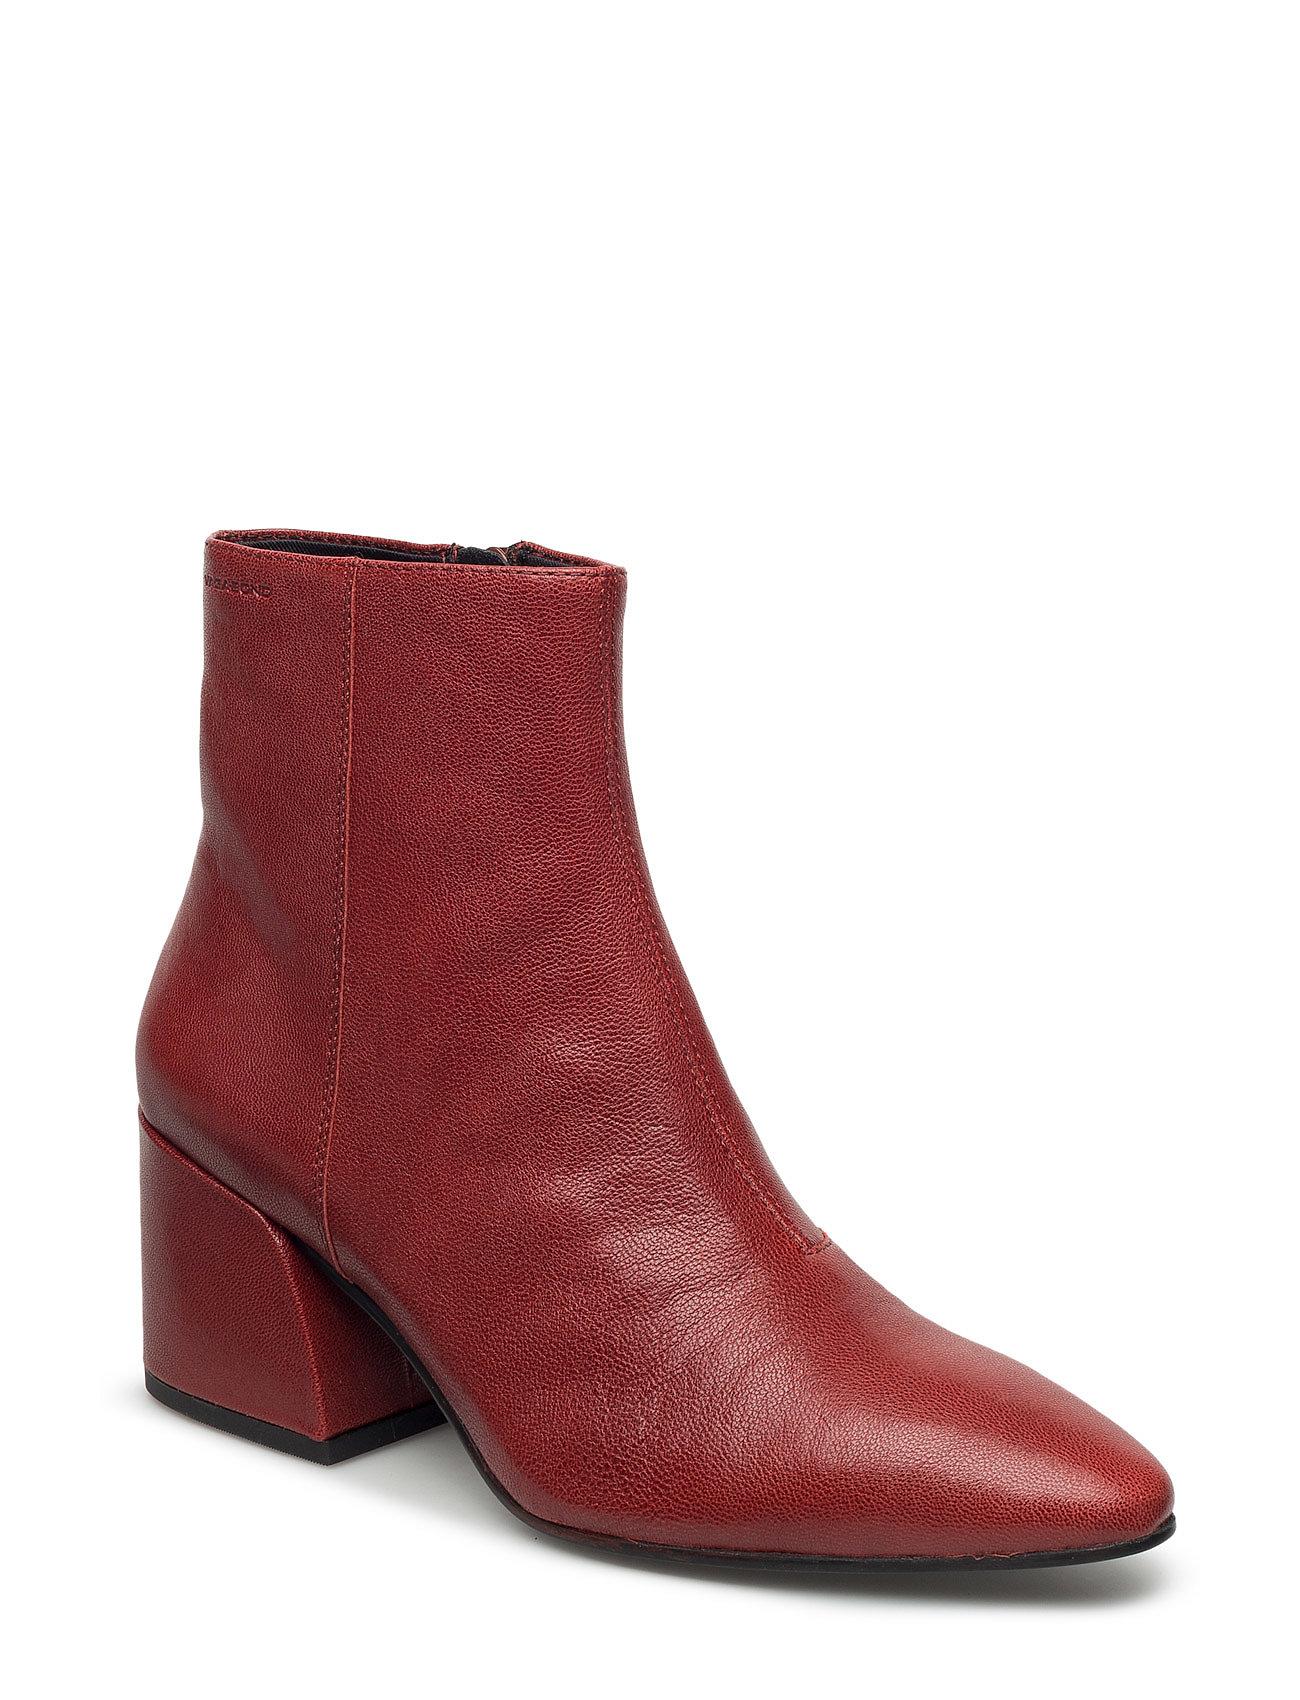 c47c29364398 Olivia VAGABOND Støvler til Kvinder i Rød